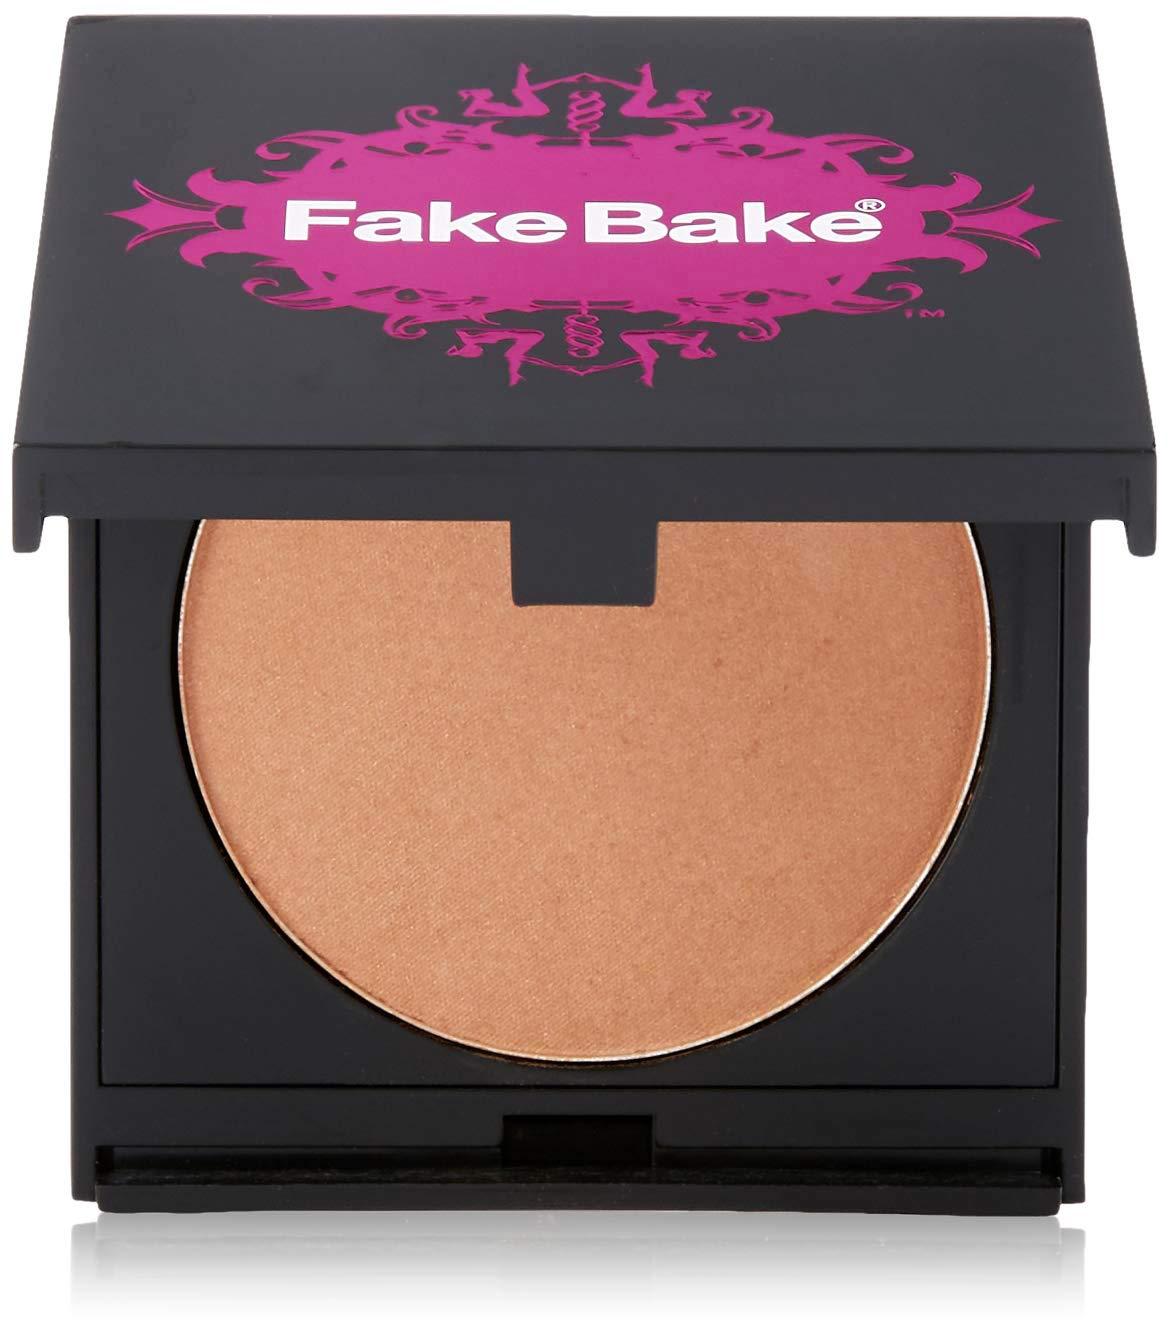 Blush Bronzer by Fake Bake | Cream Based Bronzing Compact Provides Long-Lasting Pigmentation Results | 8 grams